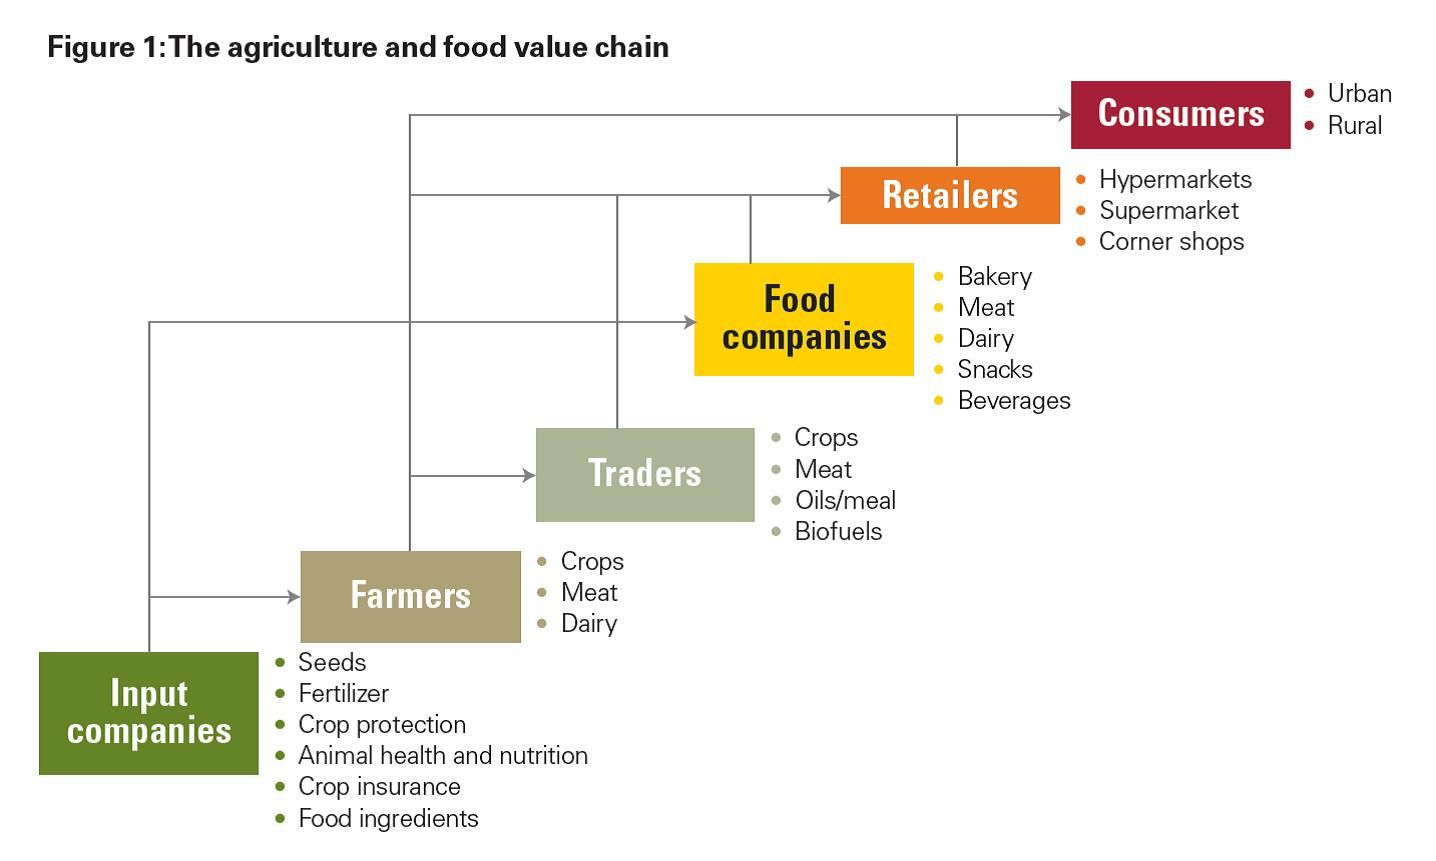 KPMG Value Chain Diagram | Food Vertical | Circular economy, Chain